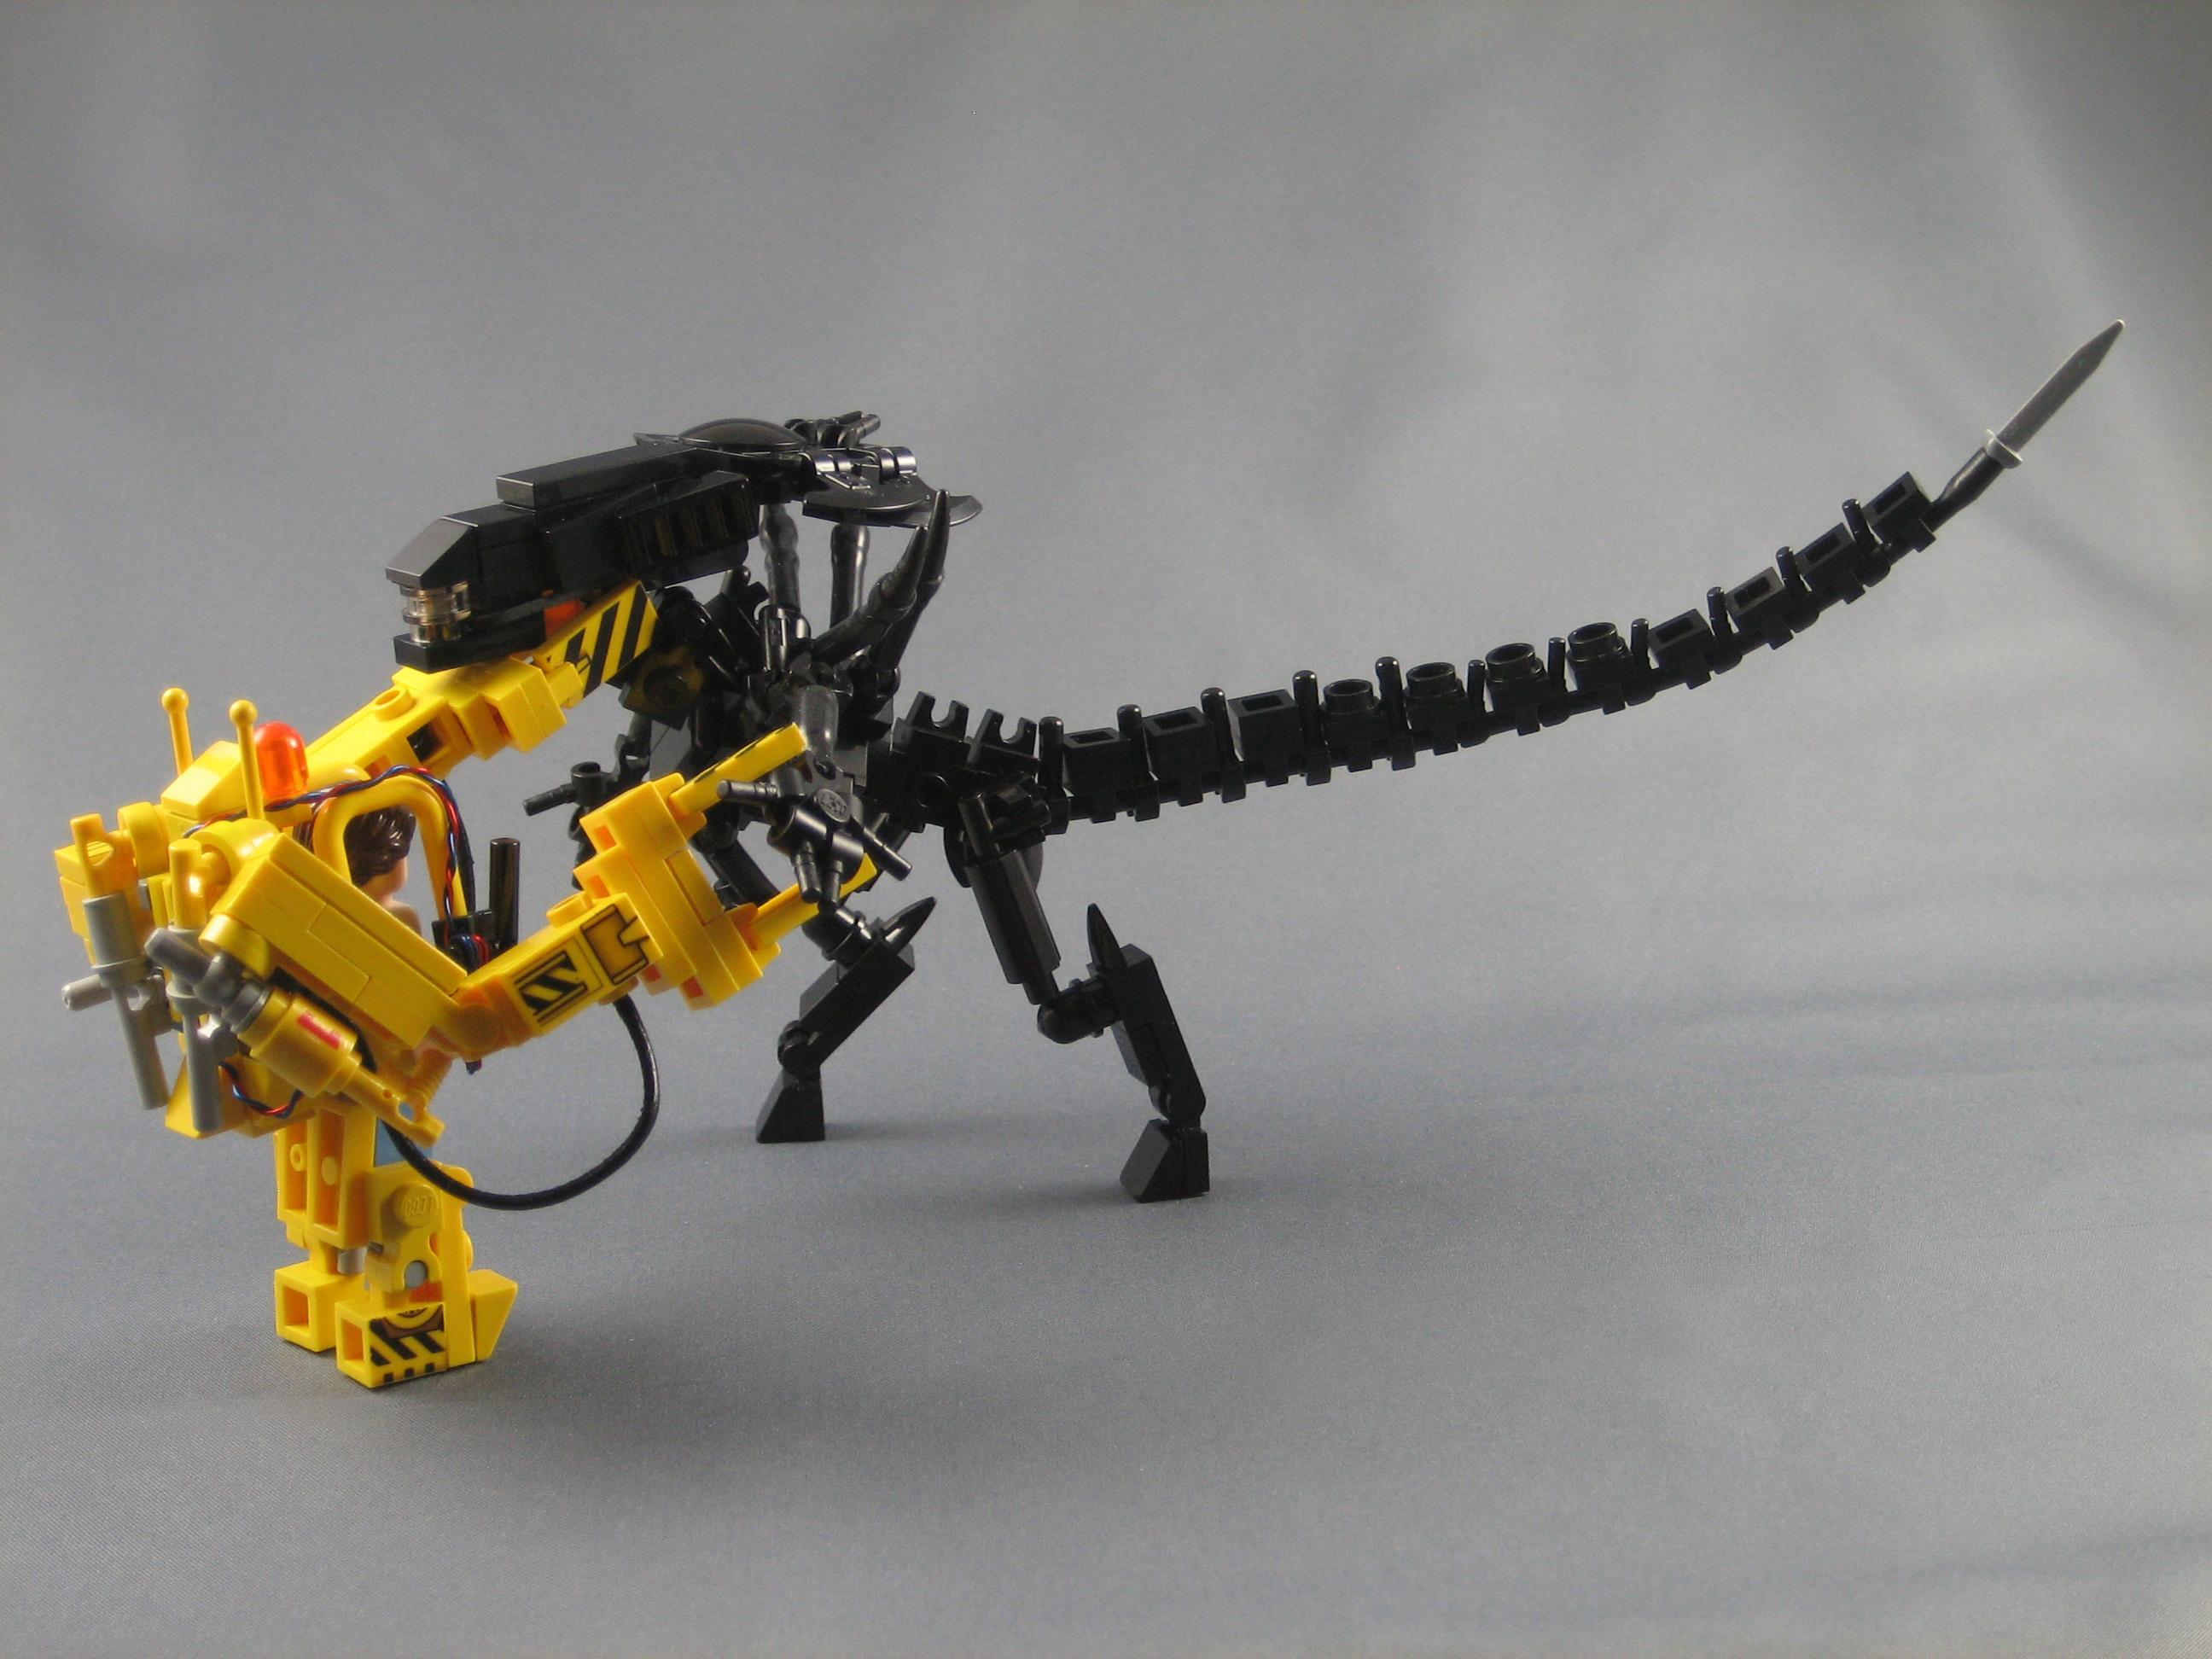 Wallpaper : LEGO, Xenomorph, aliens, Toy, machine, Queen ...